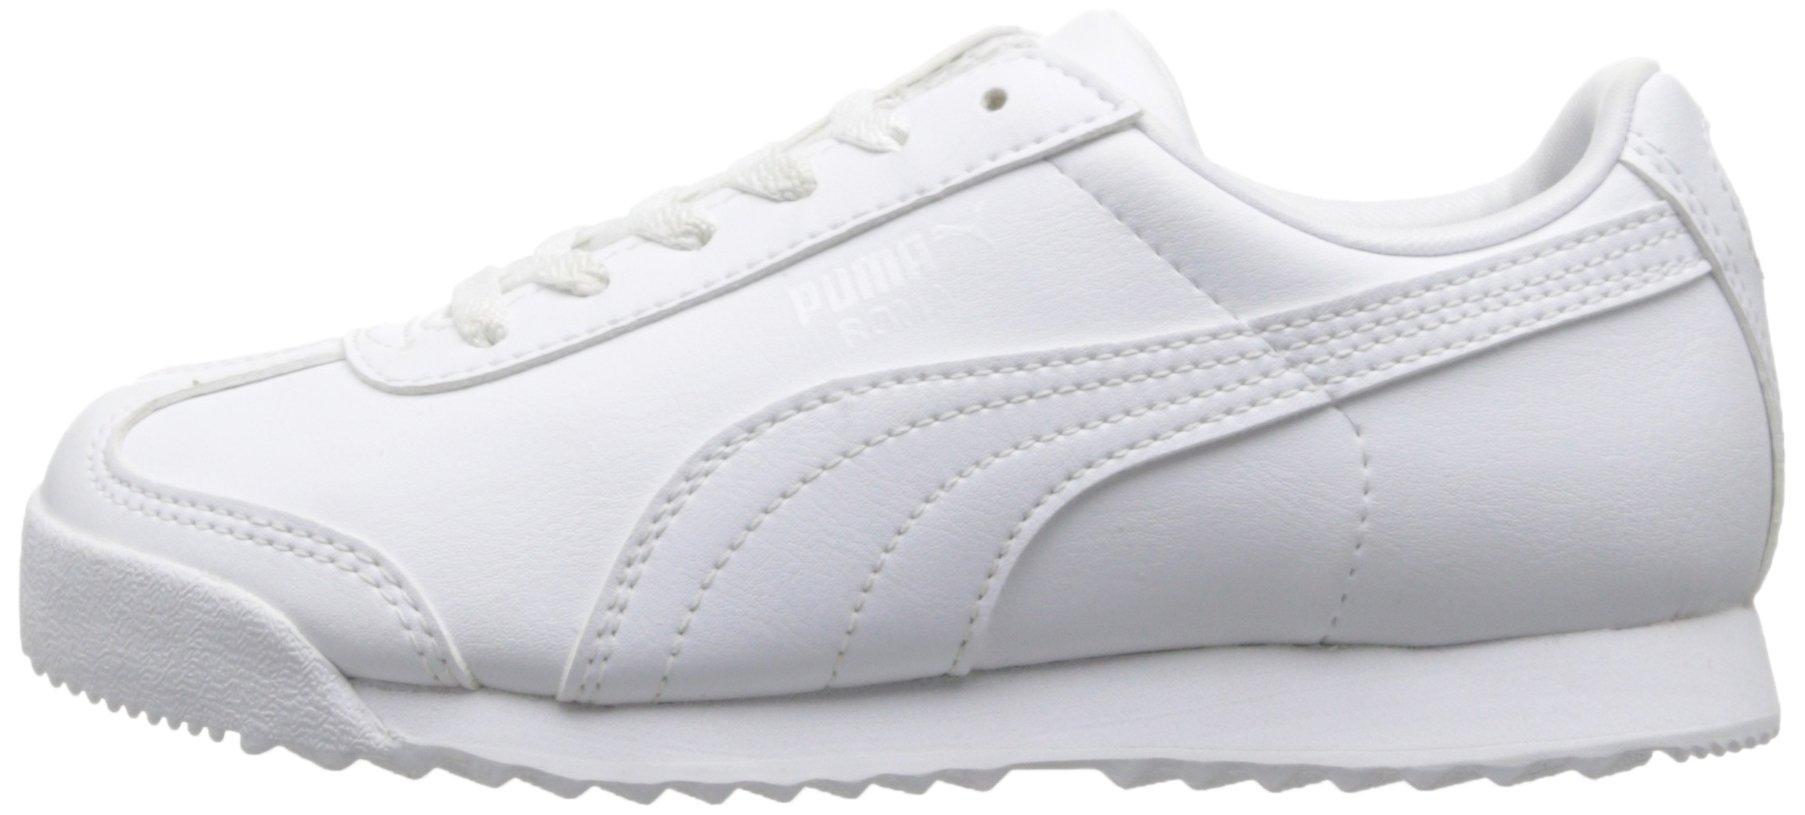 PUMA Roma Basic Kids Sneaker (Toddler/Little Kid/Big Kid), White/Light Gray, 2.5 M US Little Kid by PUMA (Image #5)